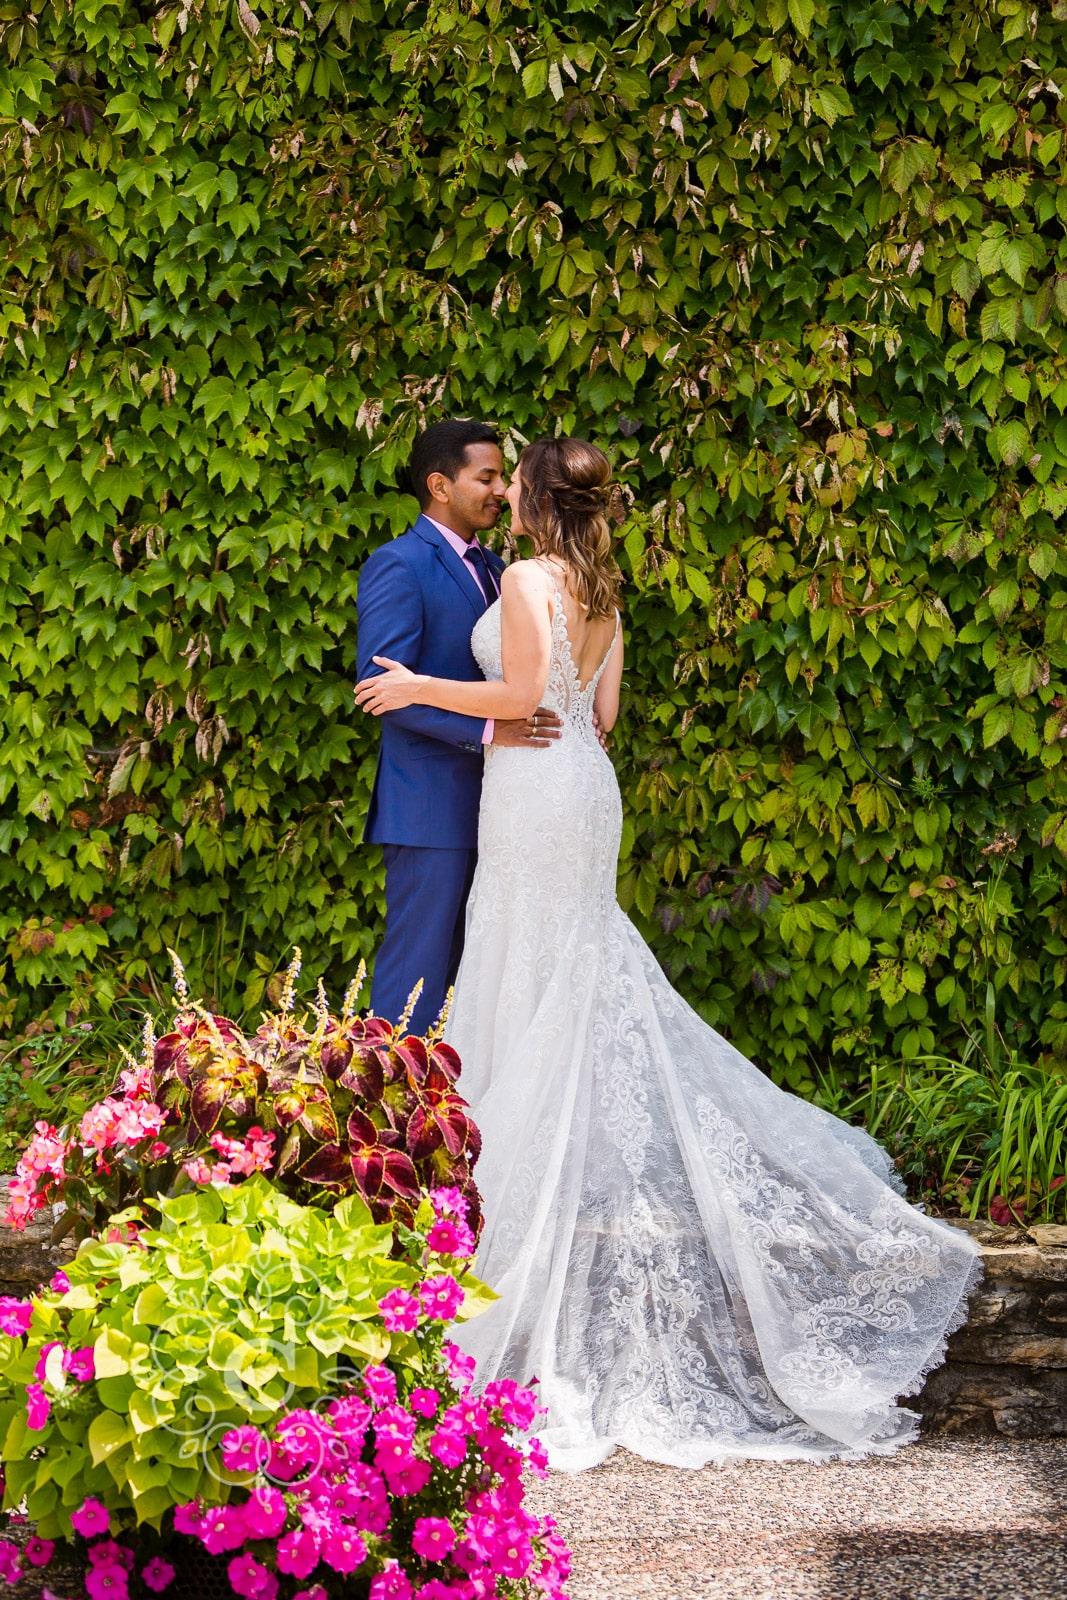 Boe Chapel St Olaf College Northfield MN Wedding